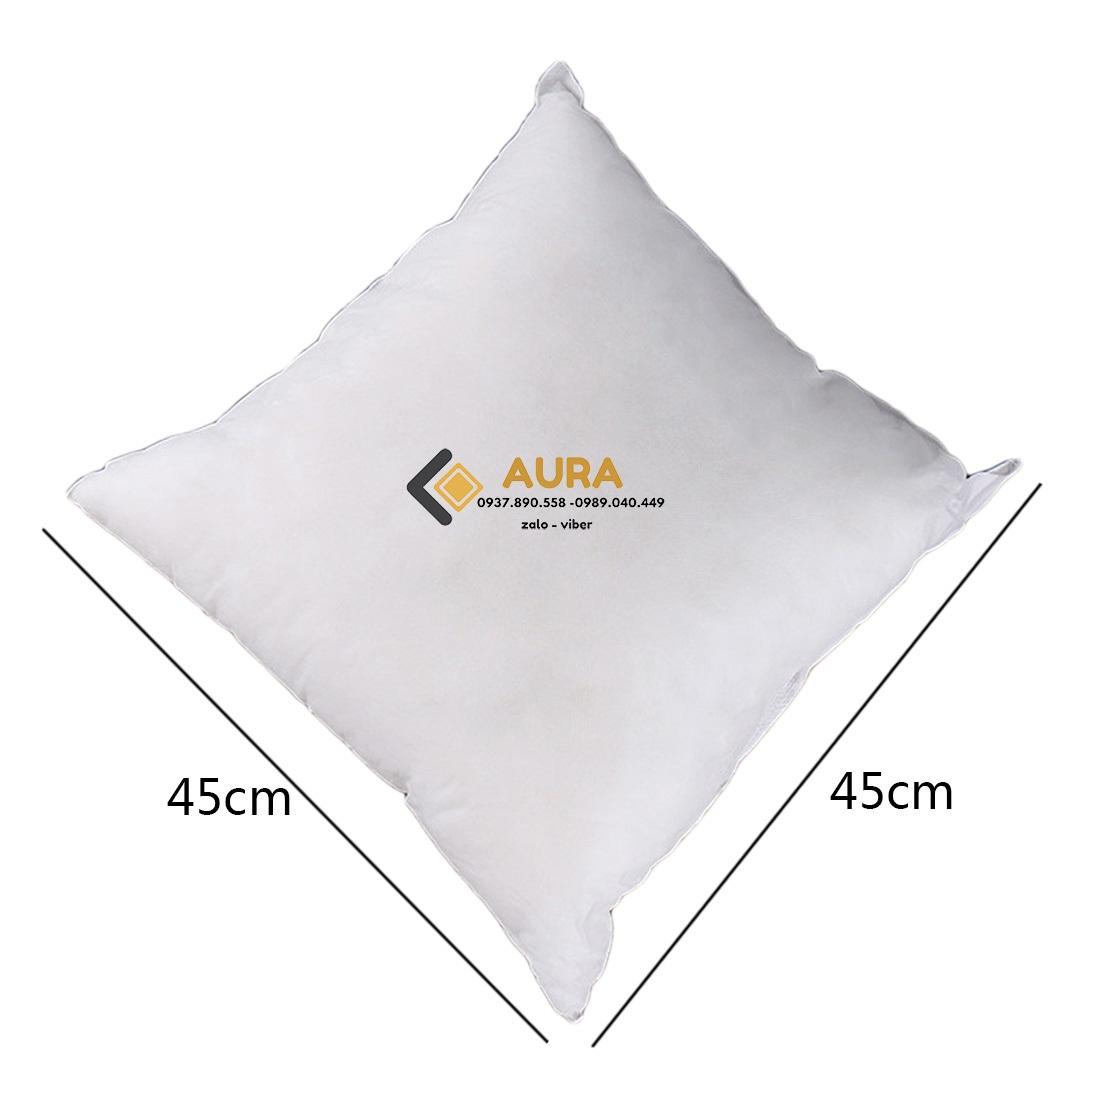 ruot-goi-tua-lung-45×45-aura-trang-tri-quan-cafe-tra-sua-van-phong7